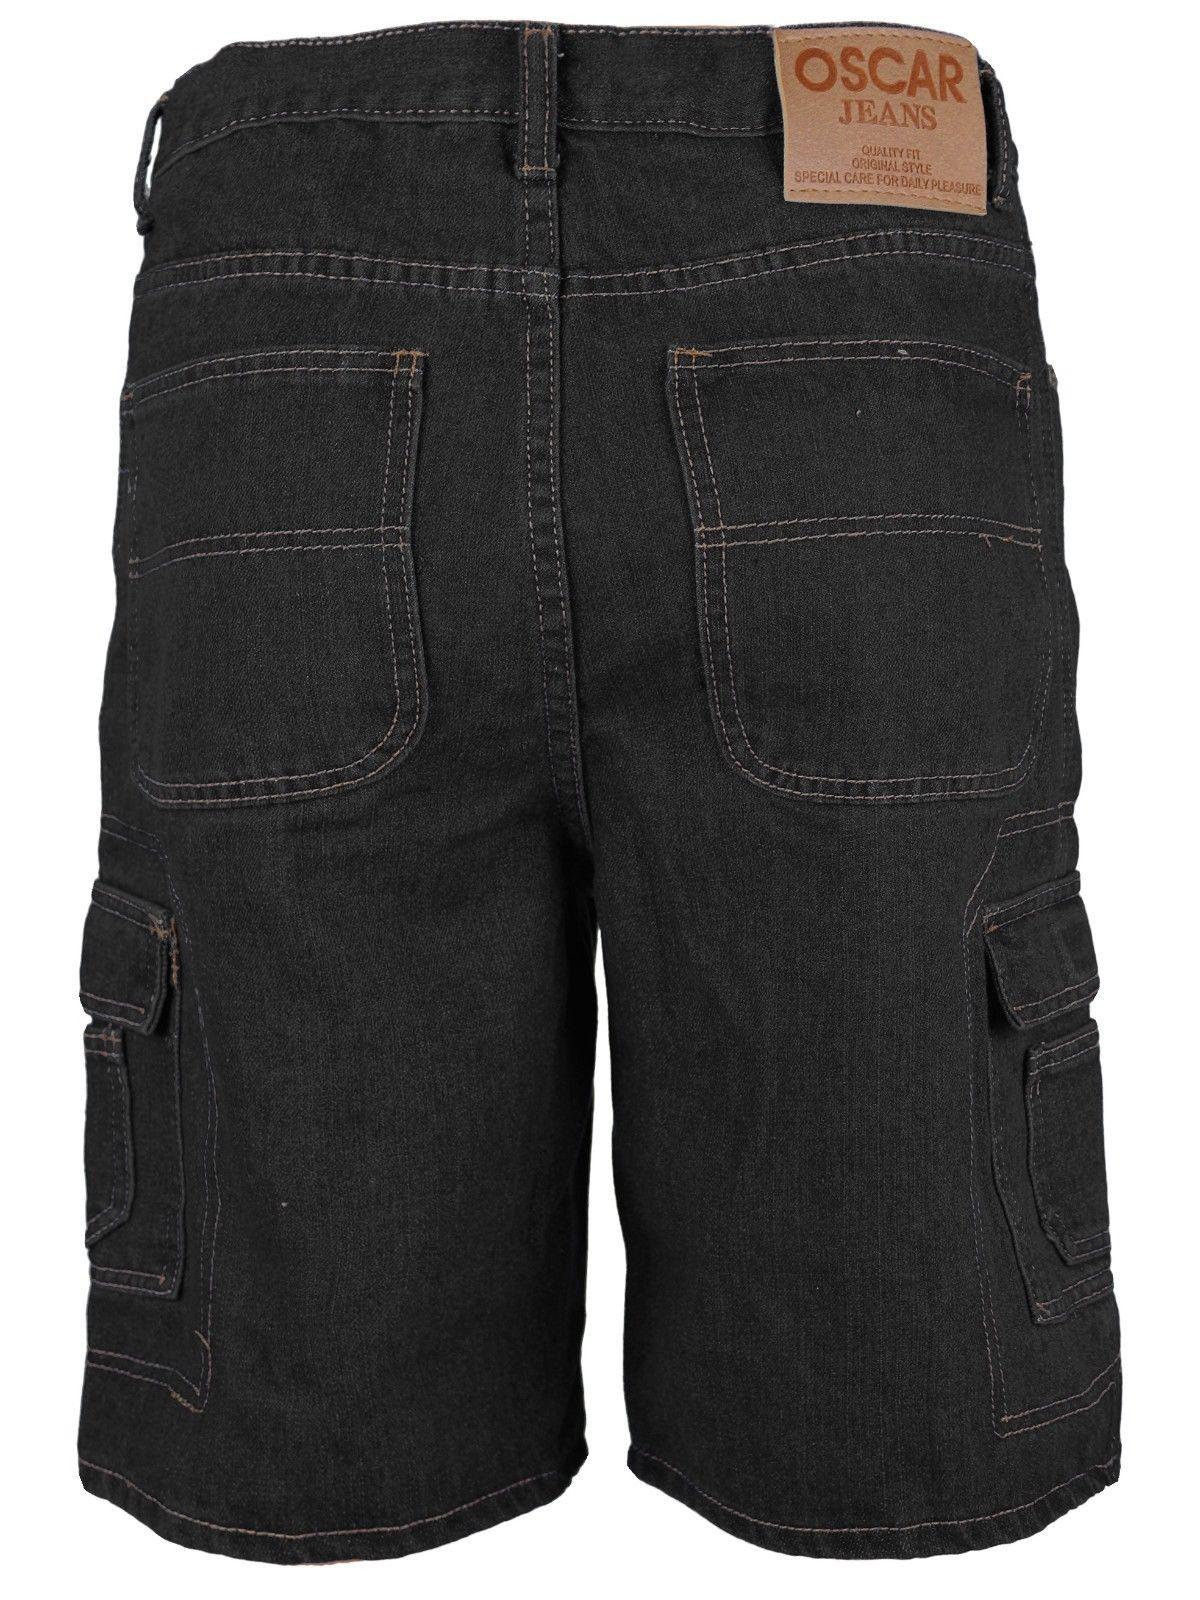 Men-039-s-Premium-Cotton-Multi-Pocket-Relaxed-Fit-Stonewash-Denim-Jean-Cargo-Shorts thumbnail 10